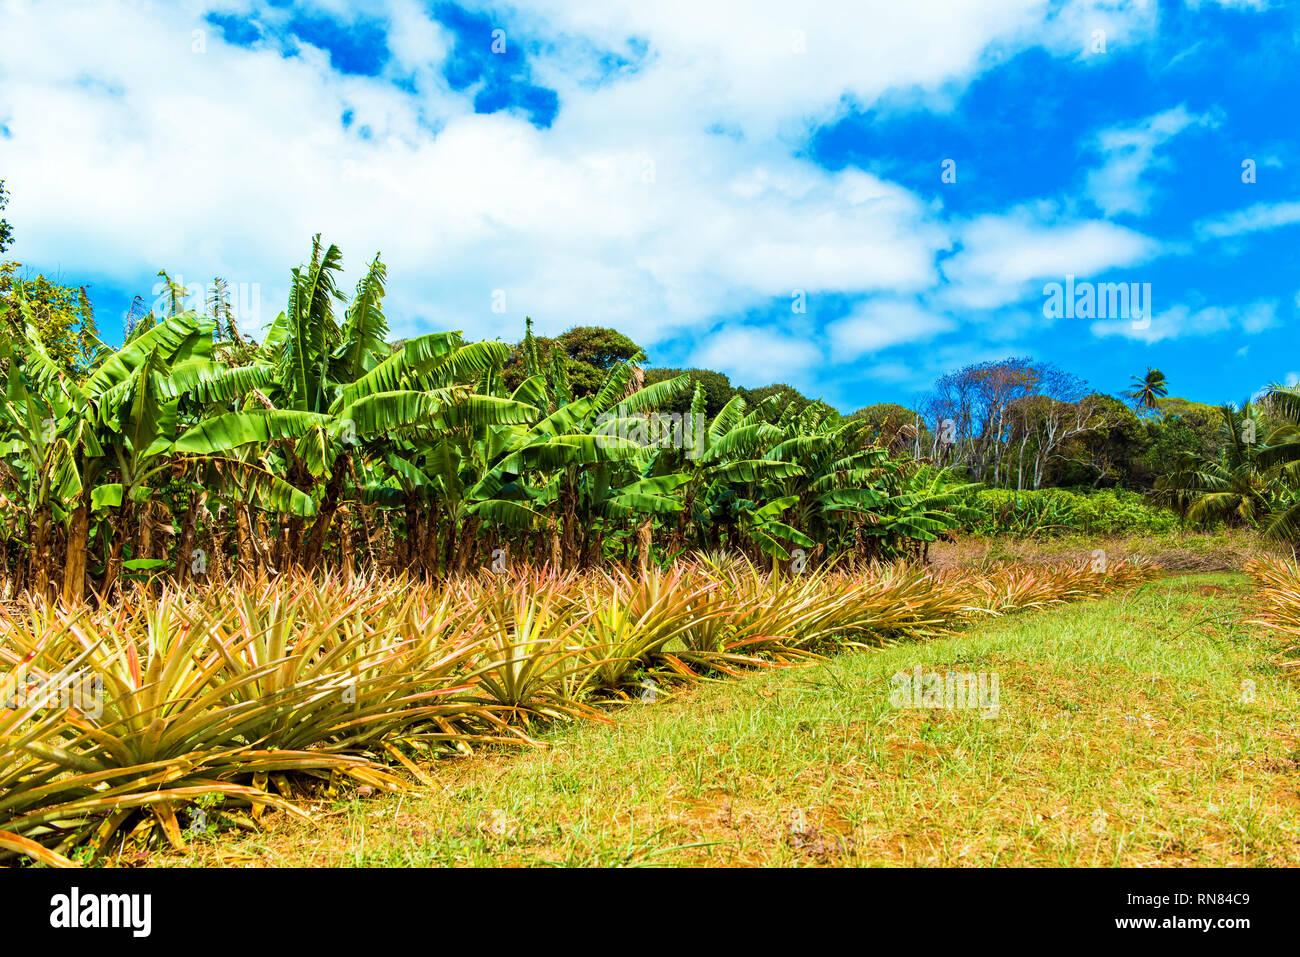 View of the pineapple plantation, Aitutaki Island, Cook Islands - Stock Image